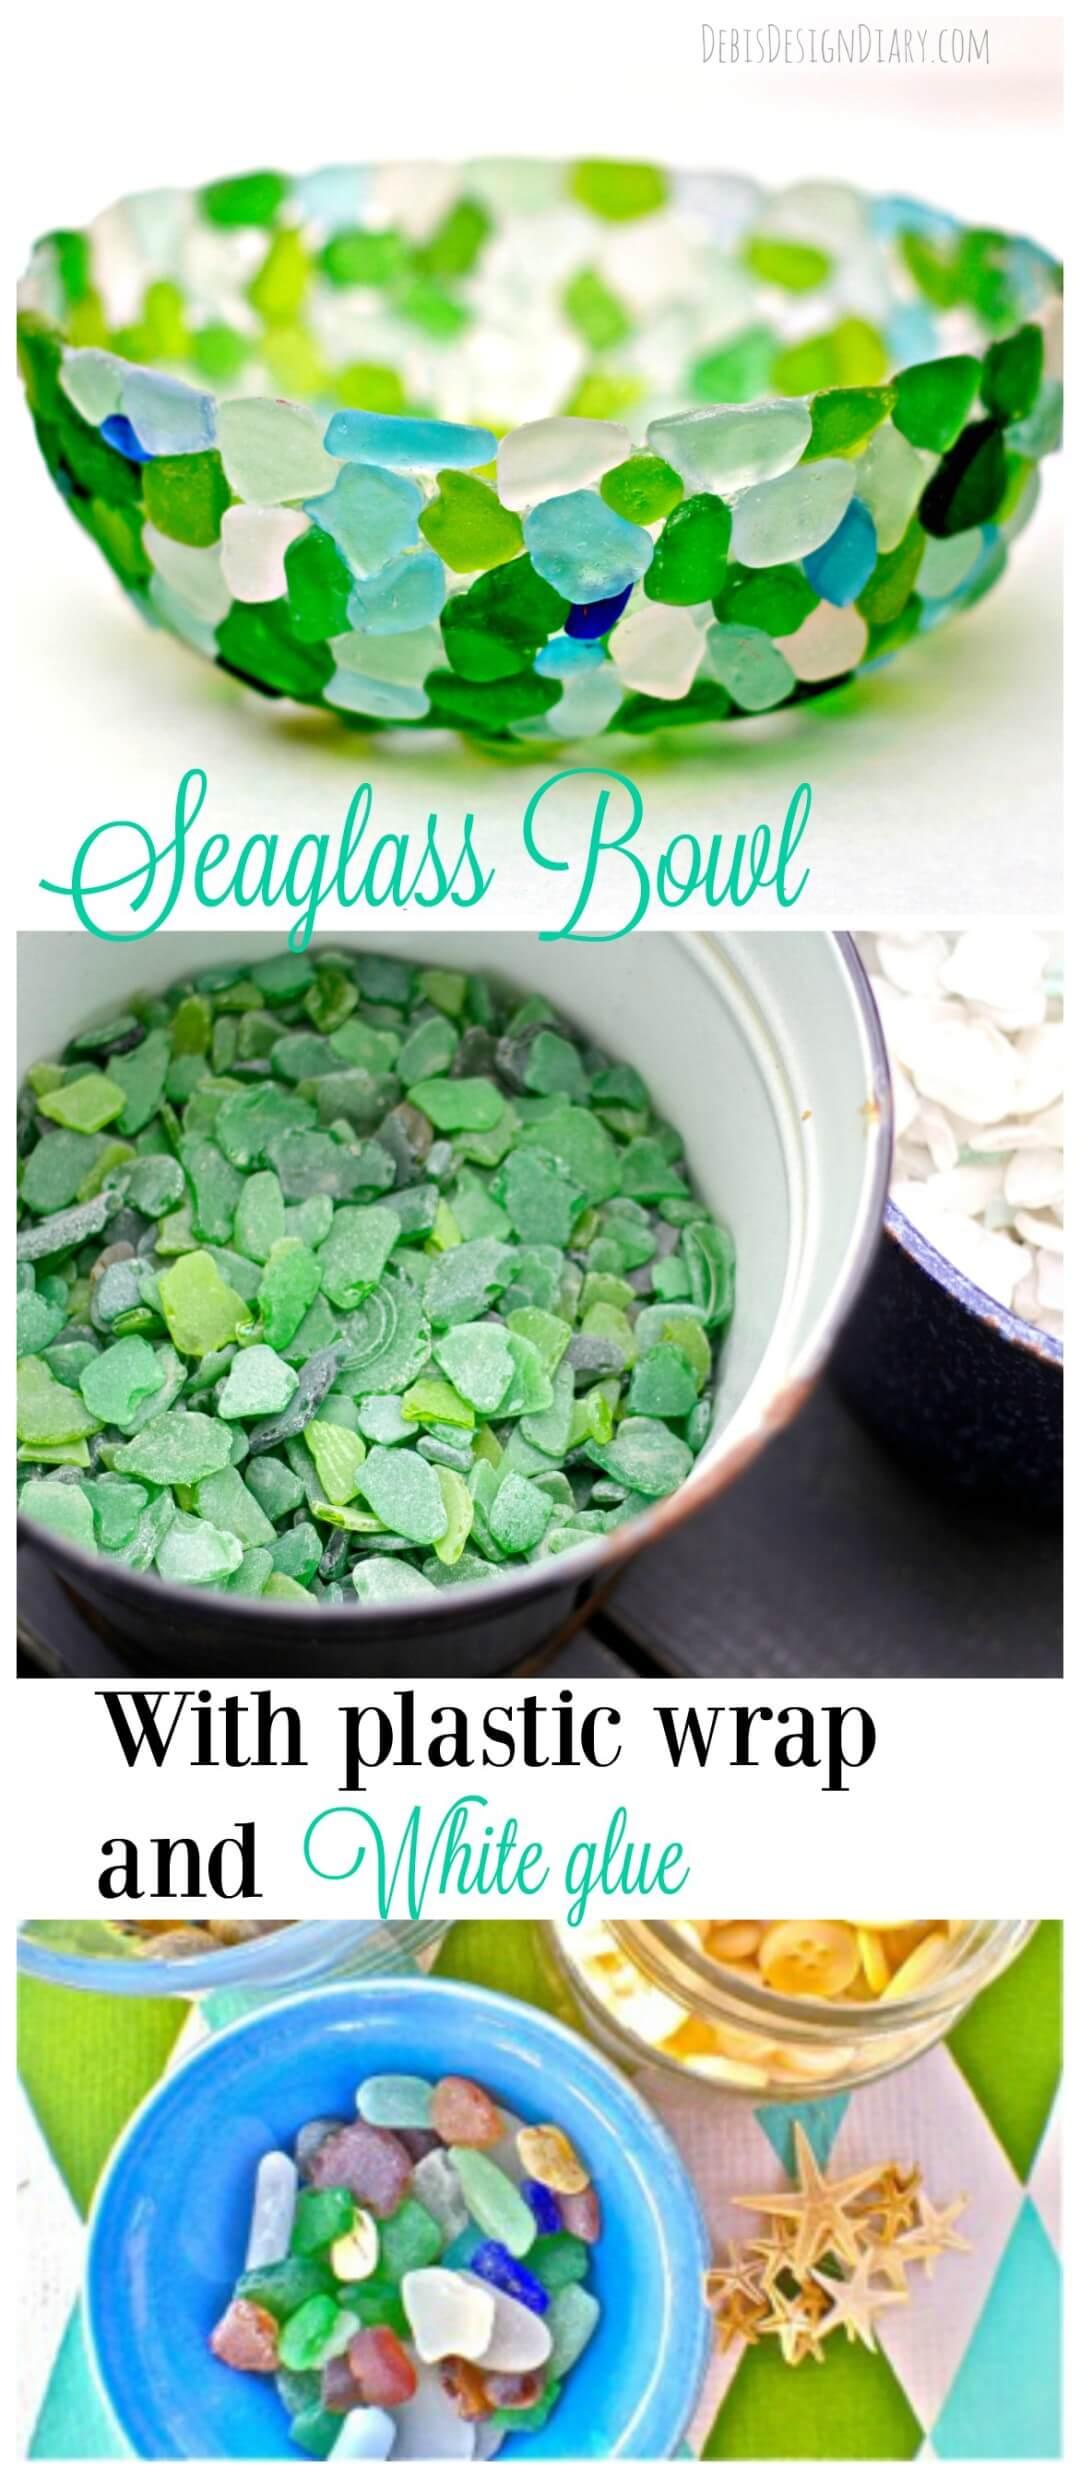 Create a Bowl Using Seaglass